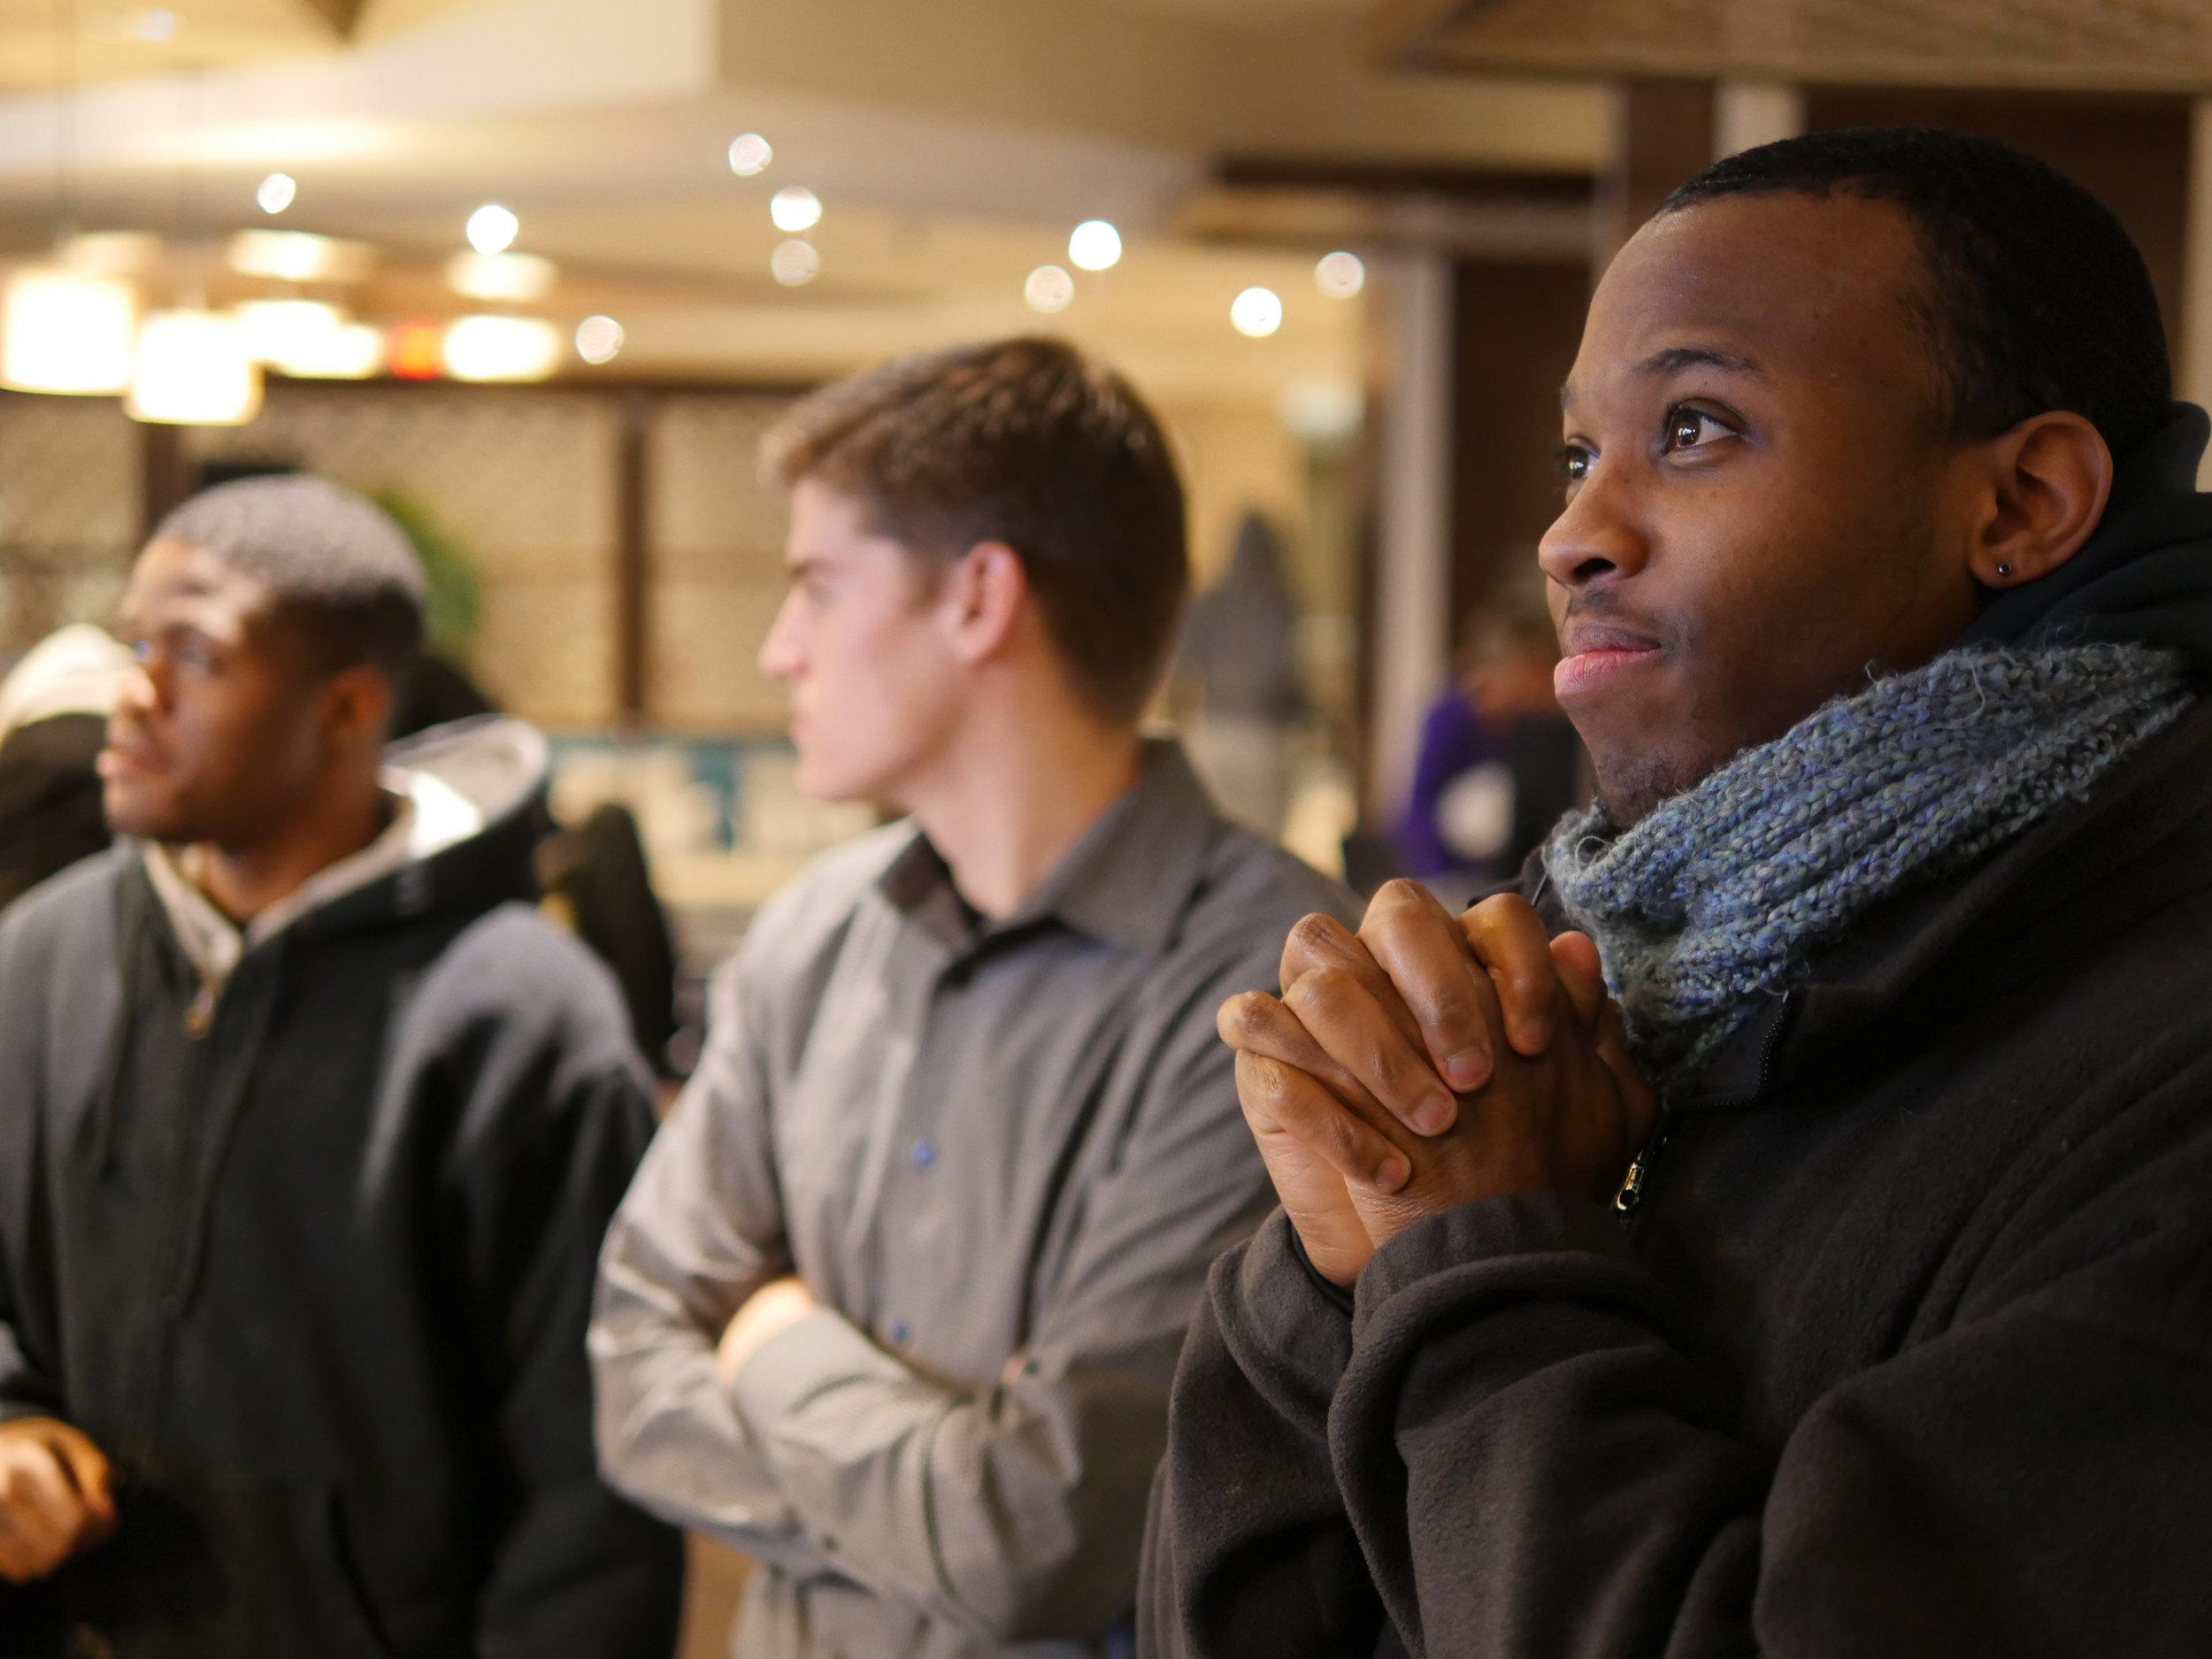 Peyton Dixon waits to hear his name called at last December's Dream League Draft